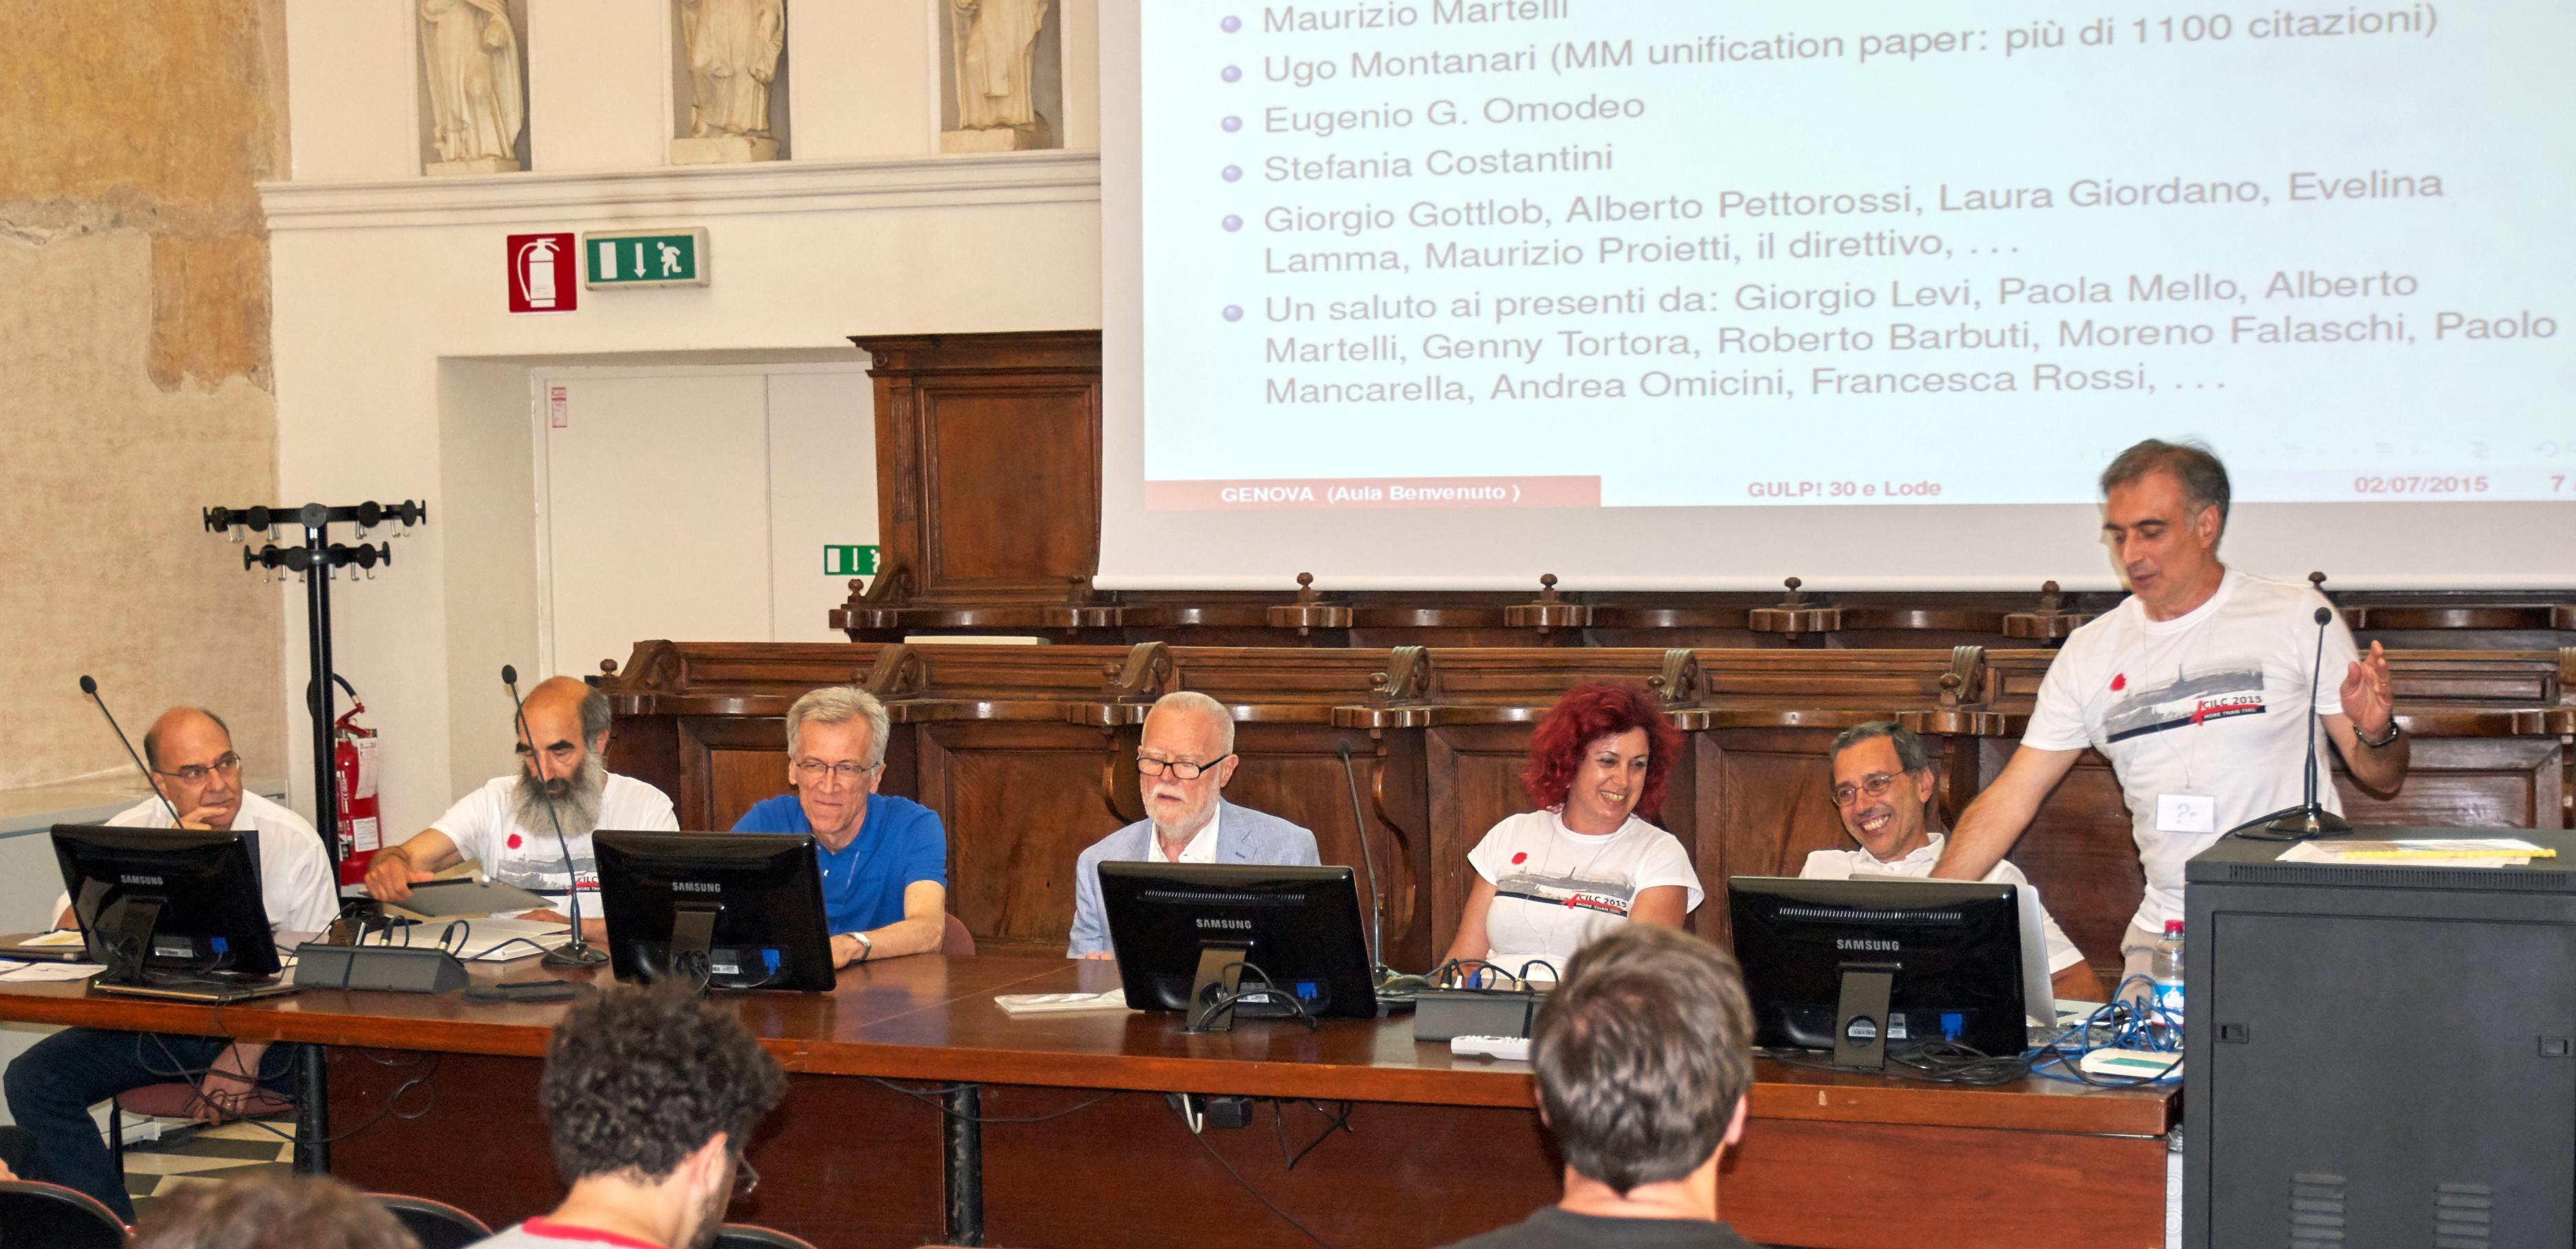 From left to right, Giovanni Adorni, Eugenio Omodeo, Gianfranco Rossi, Ugo Montanari, Stefania Costantini, Maurizio Martelli, and Agostino Dovier